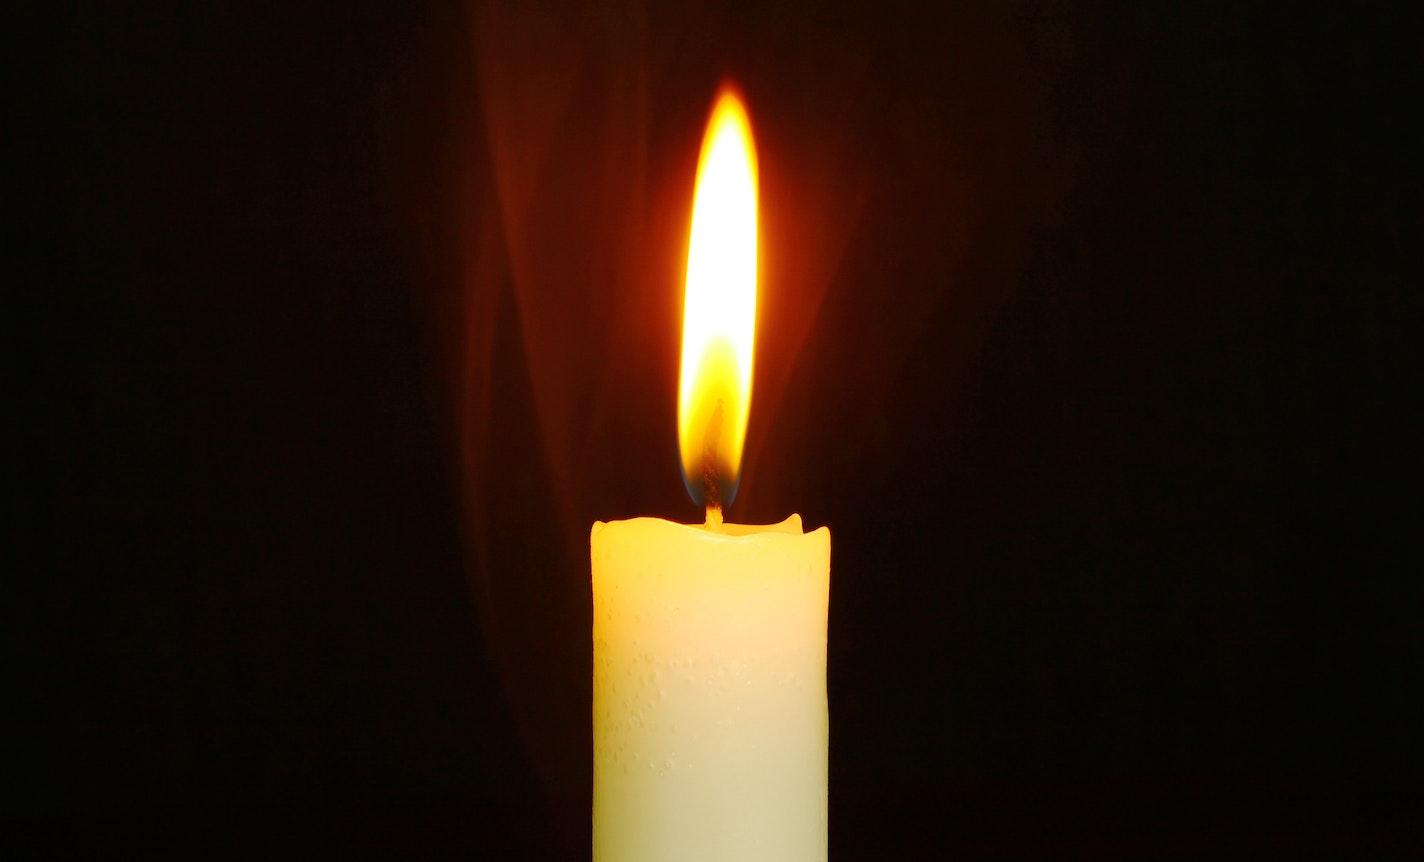 Mourning into Unity Online Candlelight Vigil